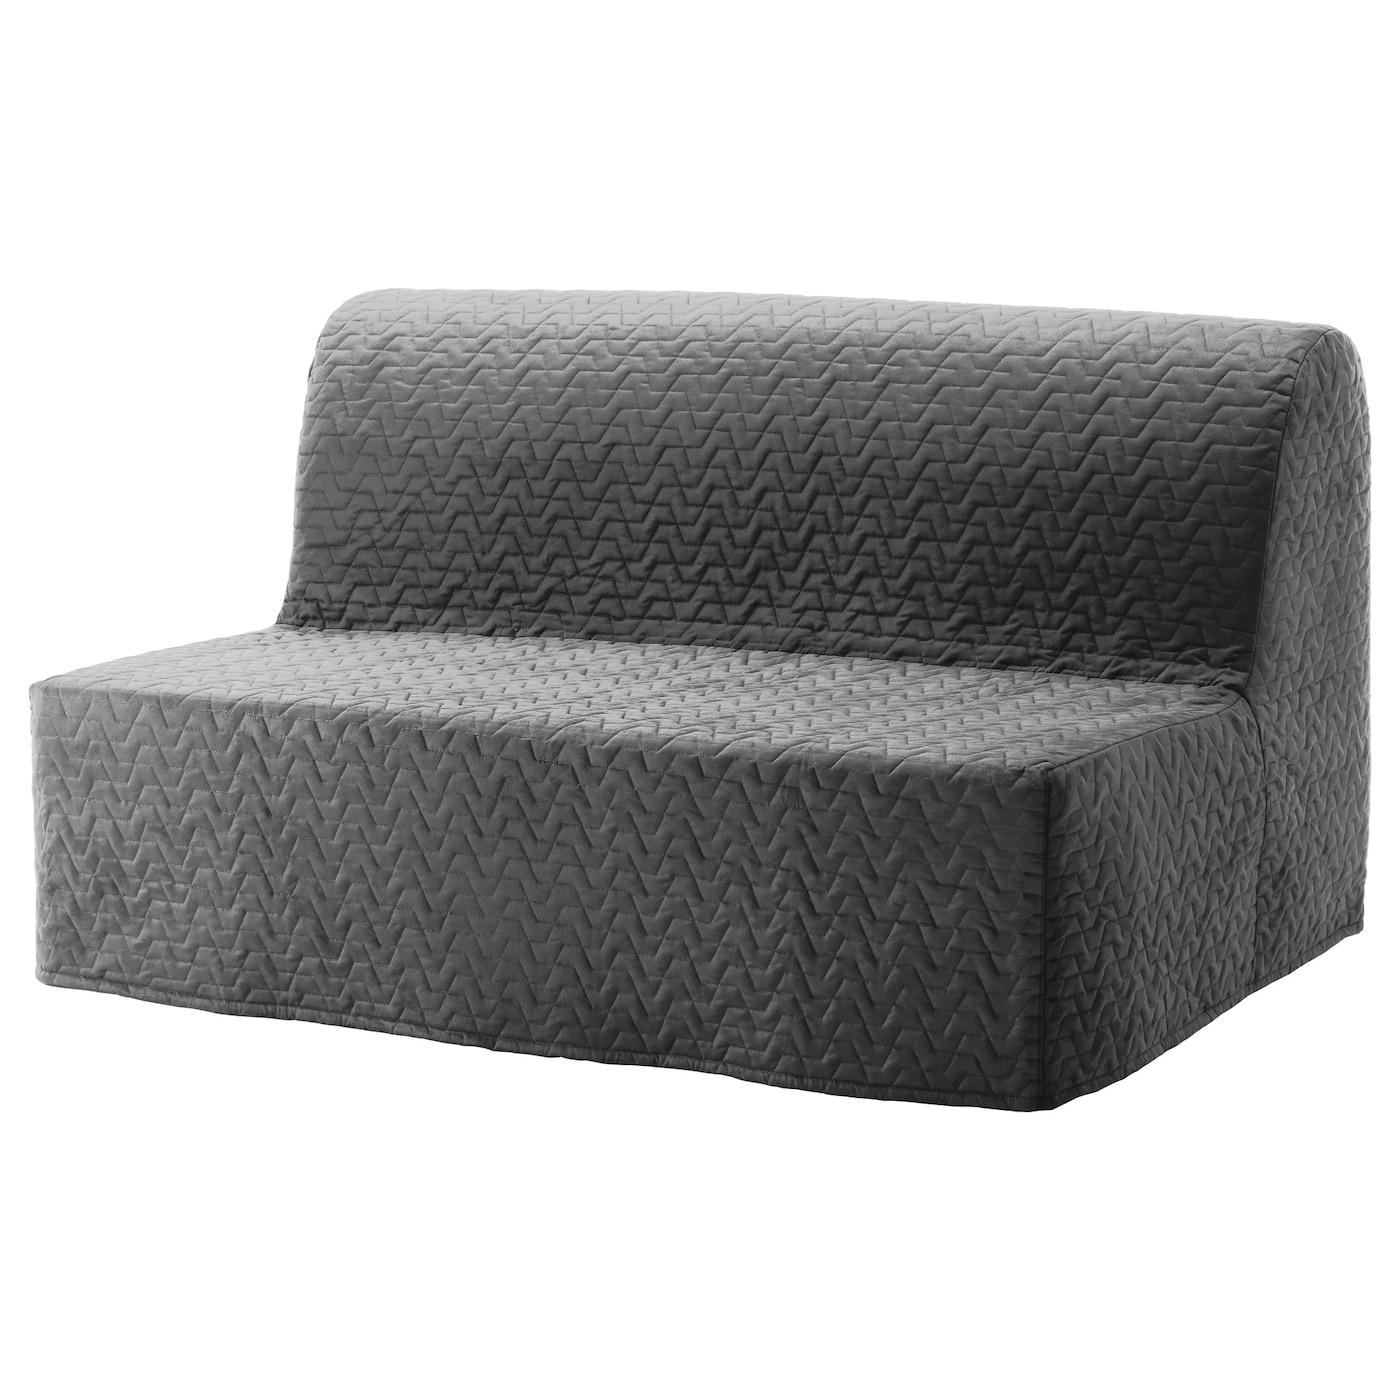 Lycksele Vallarum Grey Two Seat Sofa Bed Cover Ikea